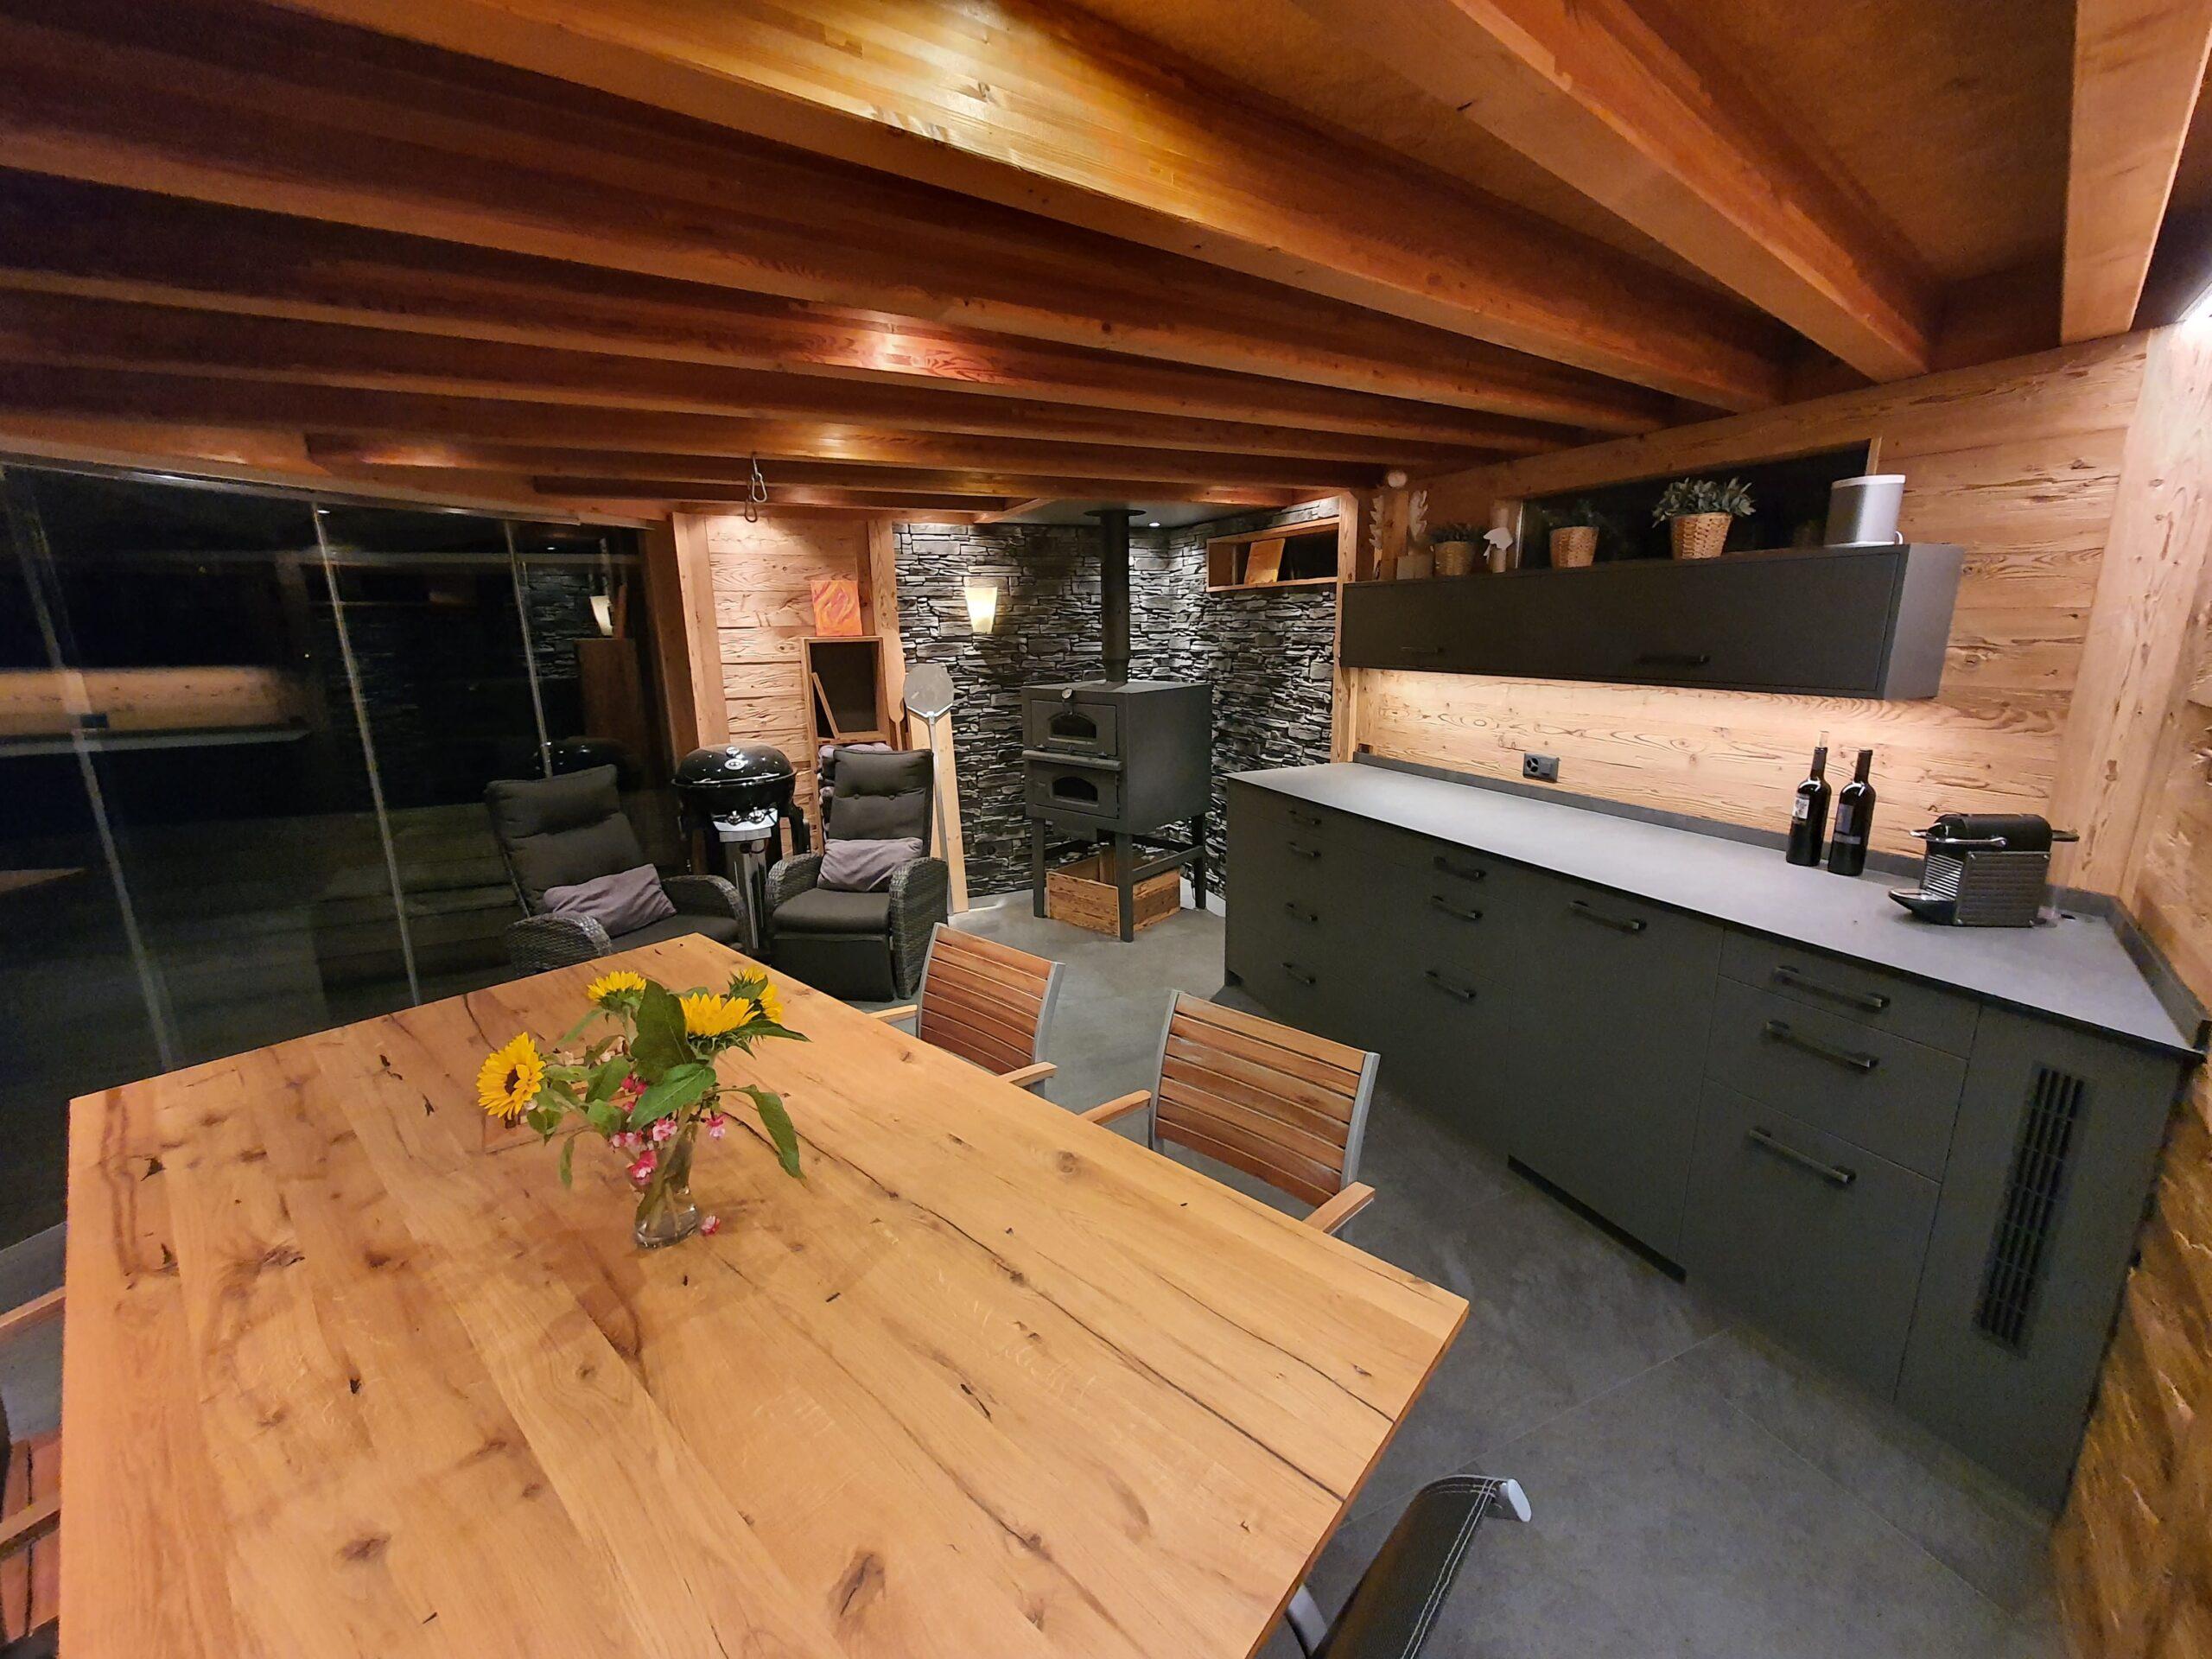 Wooddesign_Holzdesign_Pergola_Outdoor-Küche_Altholz_modern_rustikal_Pizzaofen_Steinwand_LED-Beleuchtung_Outdoor-Sessel_Esstisch (8)